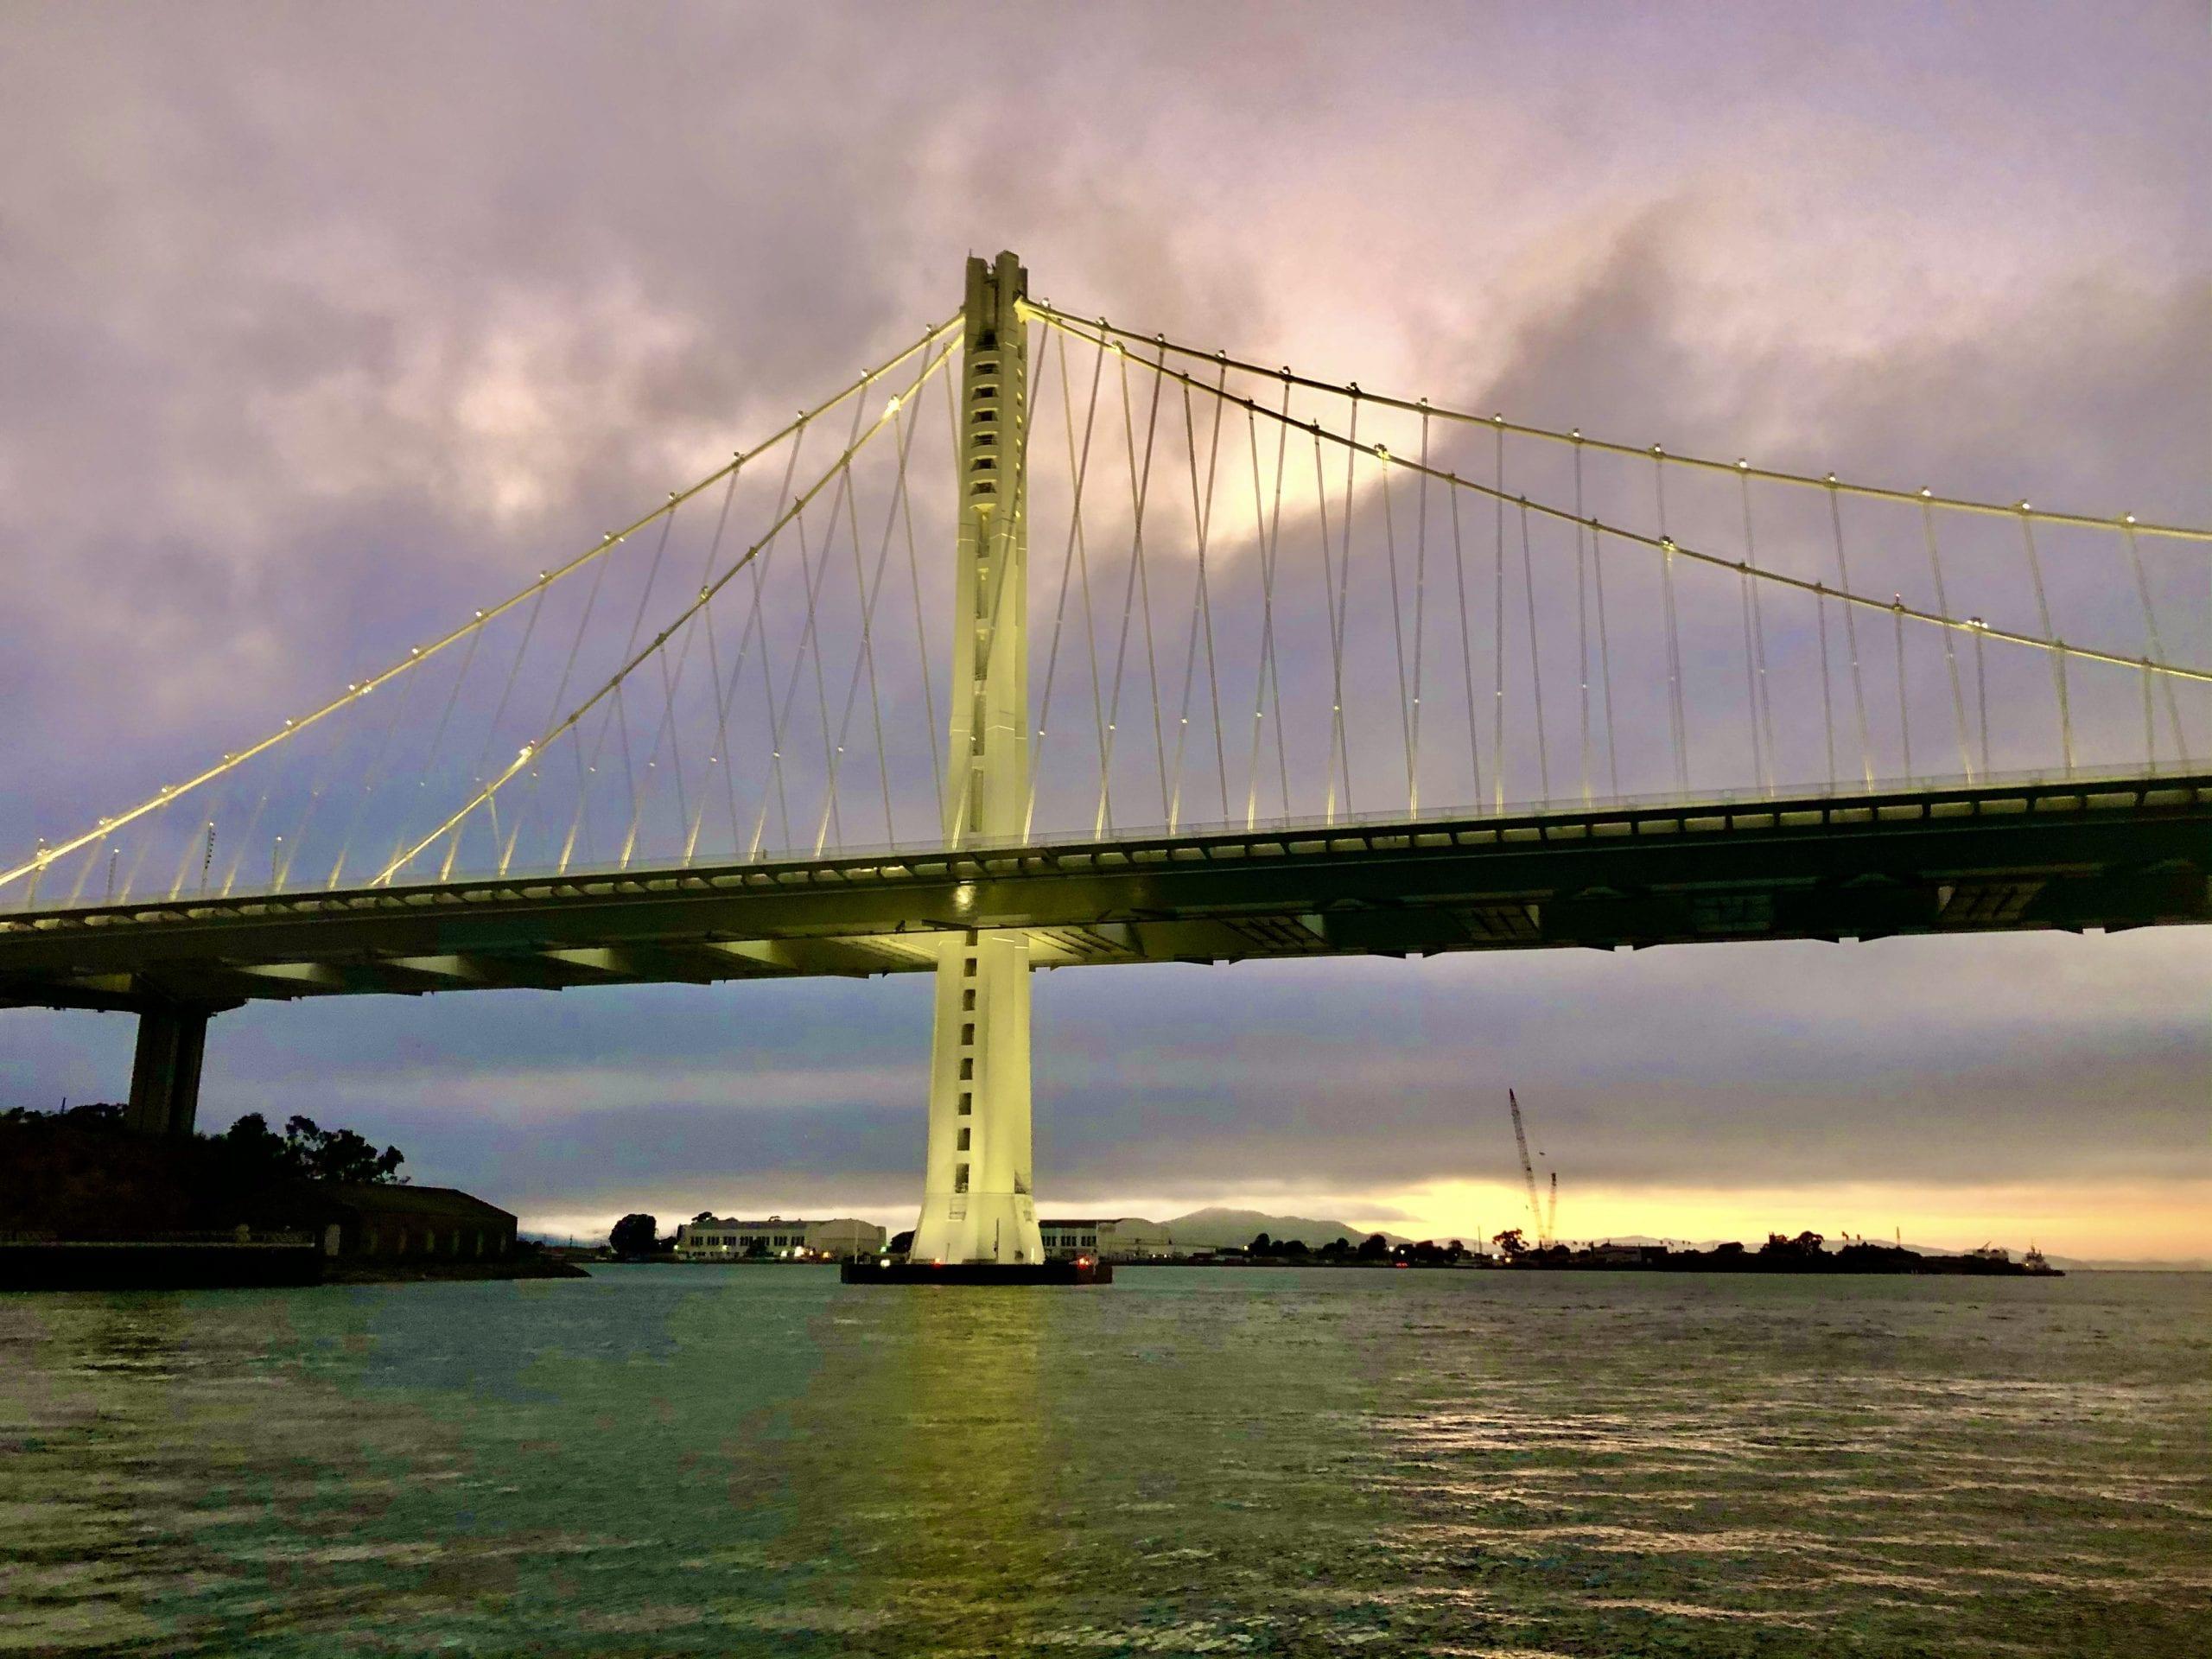 sea_valor_Bay_Bridge_Eastern_span